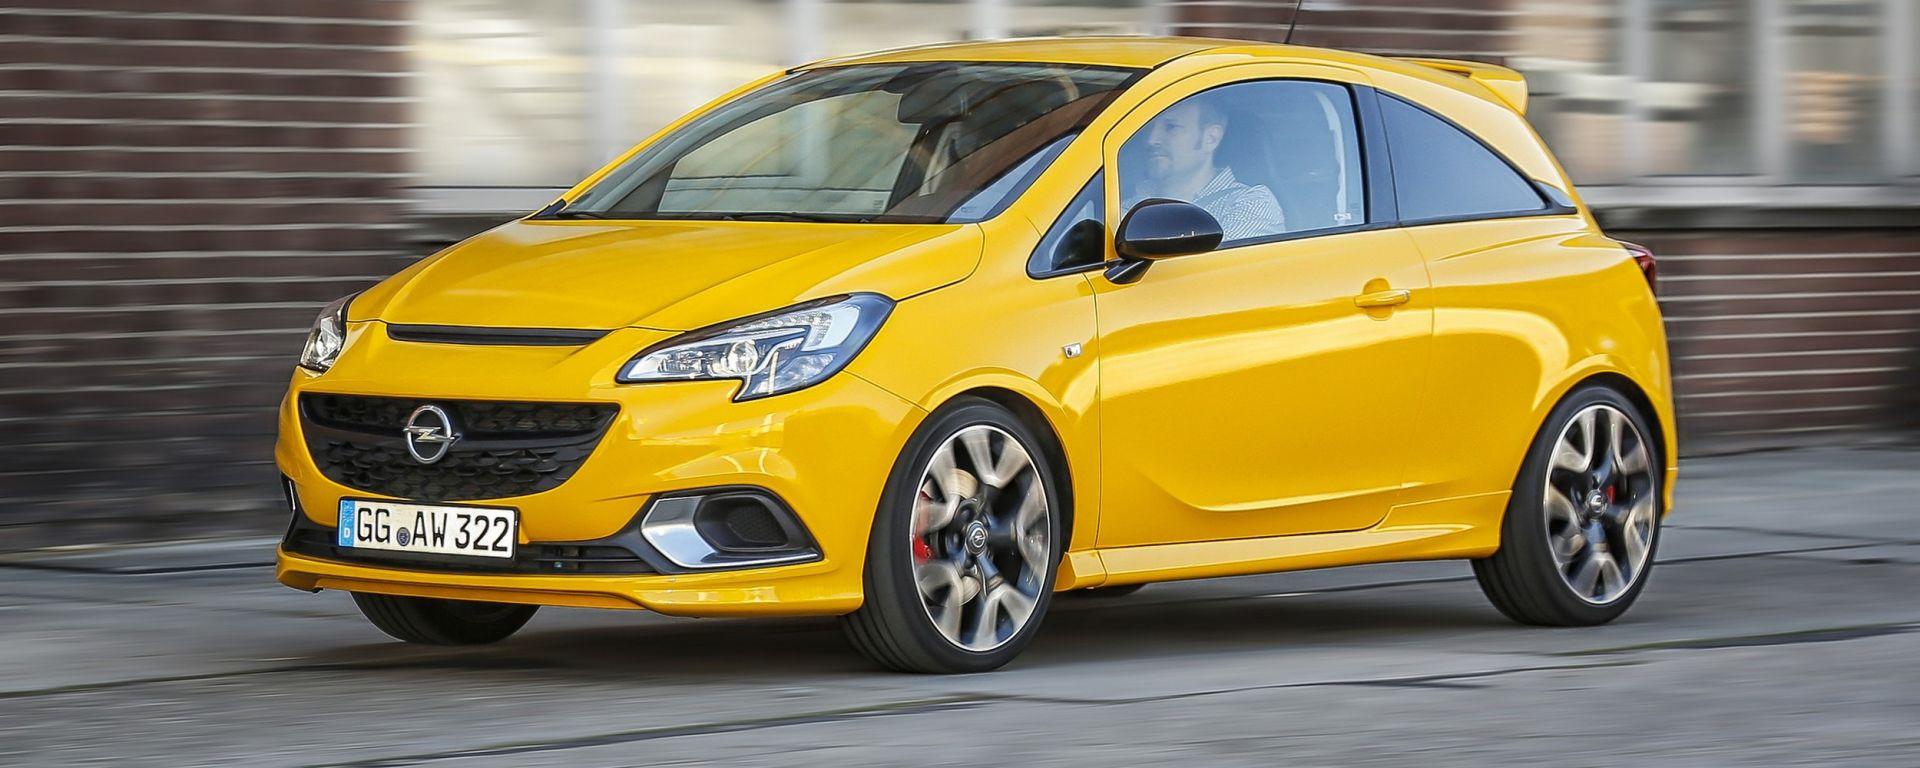 Opel Corsa GSi: ha un motore 1.4 biturbo da 150 cv